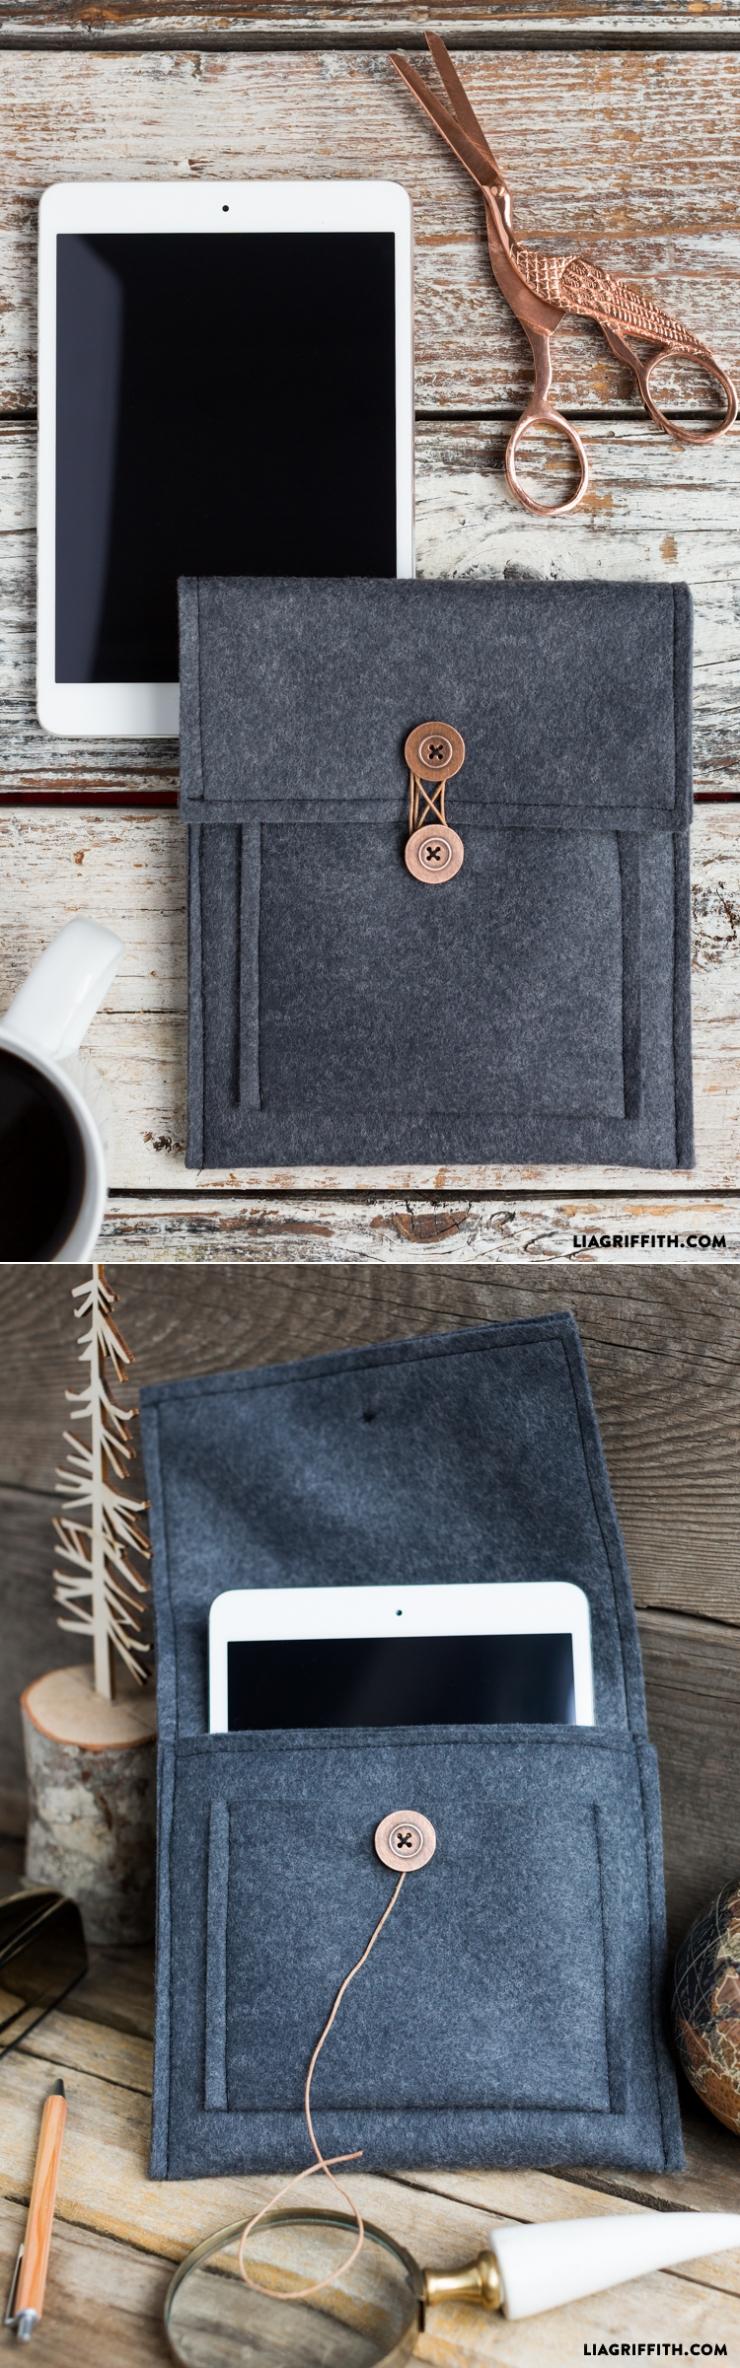 Color Me Glamorous DIY Kindle Fire Case { Tutorial }. I